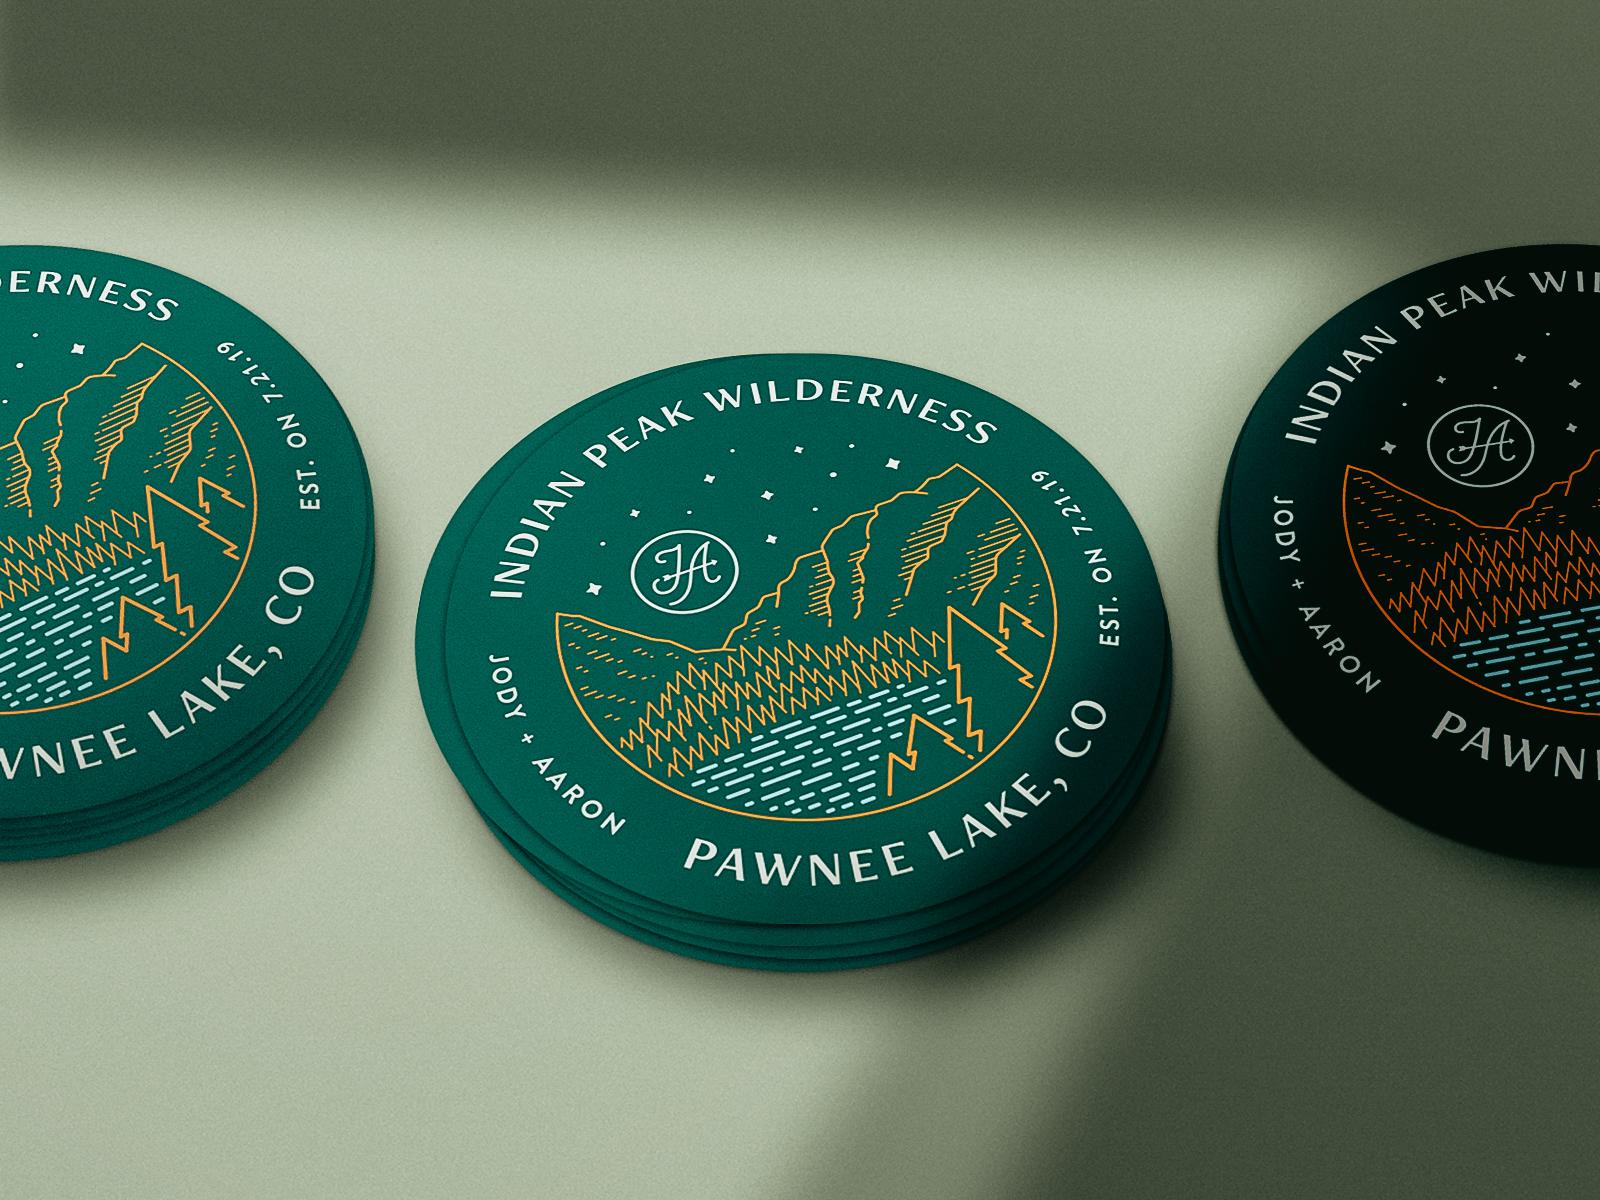 wedding-badge-sticker-pawnee-lake-colorado.jpg